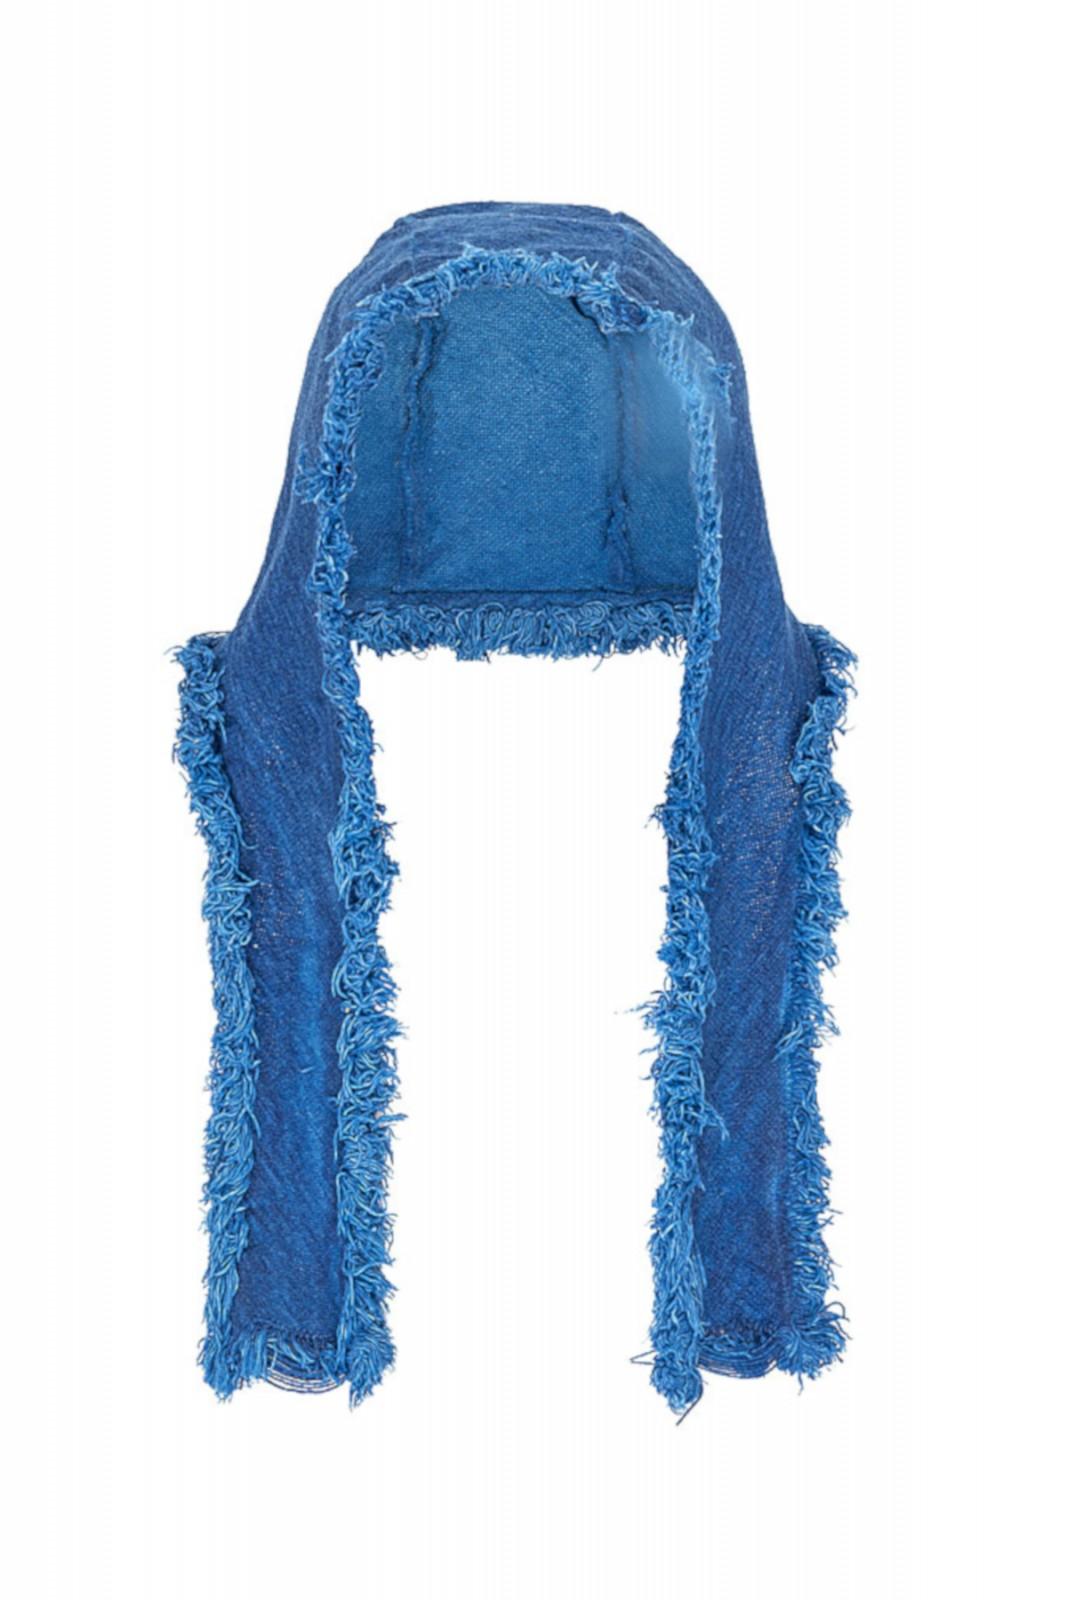 Josse - Bundhaube blau